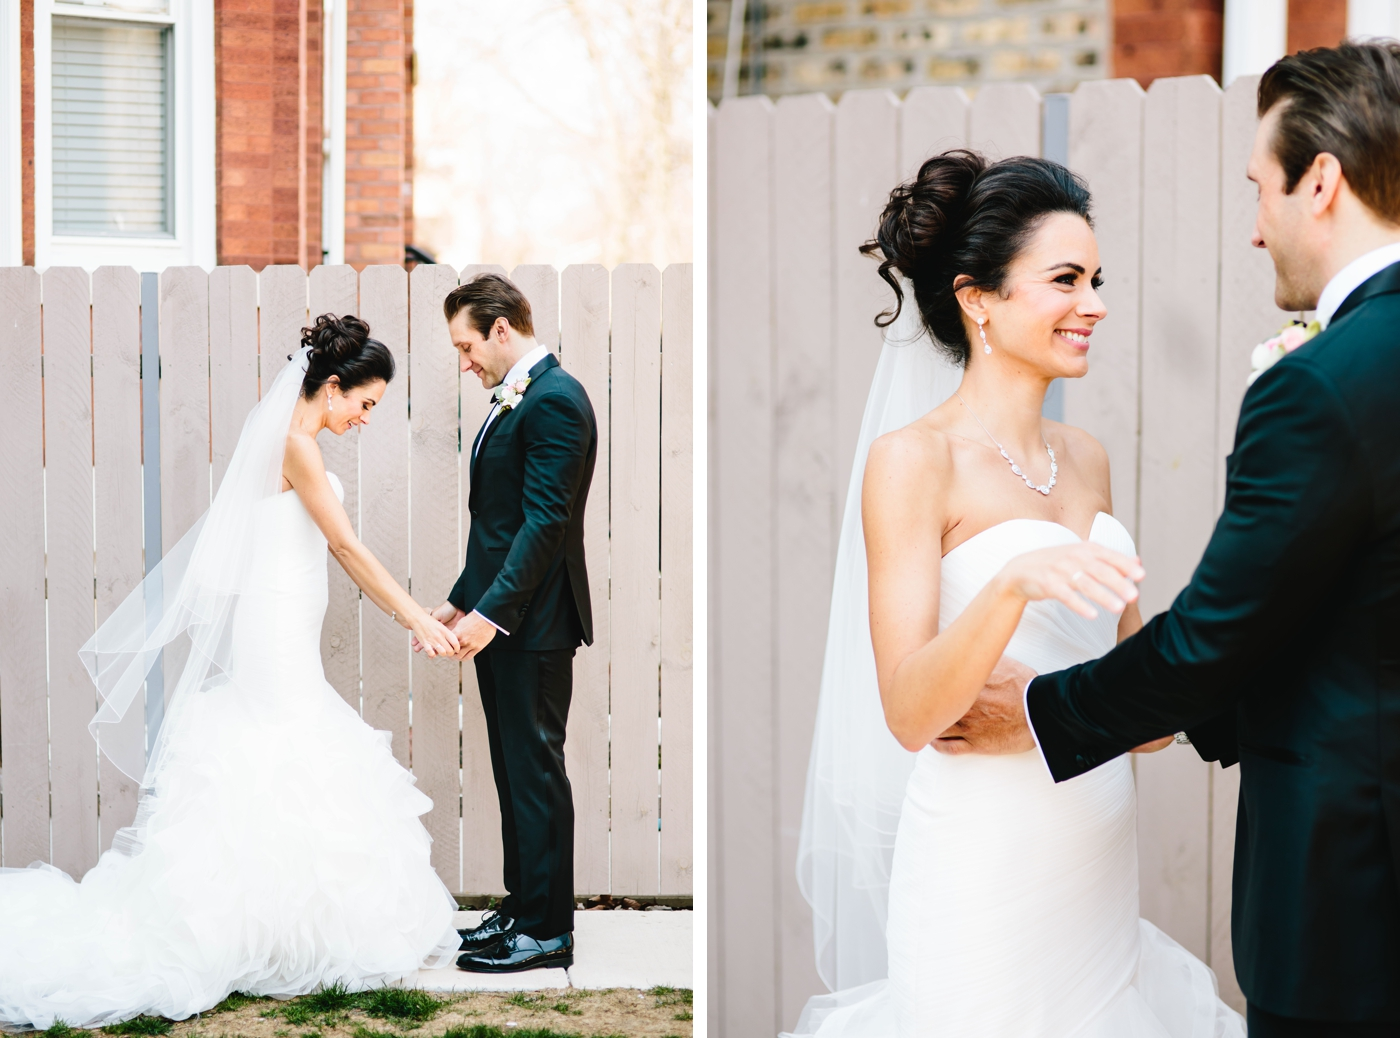 chicago-fine-art-wedding-photography-hamm21